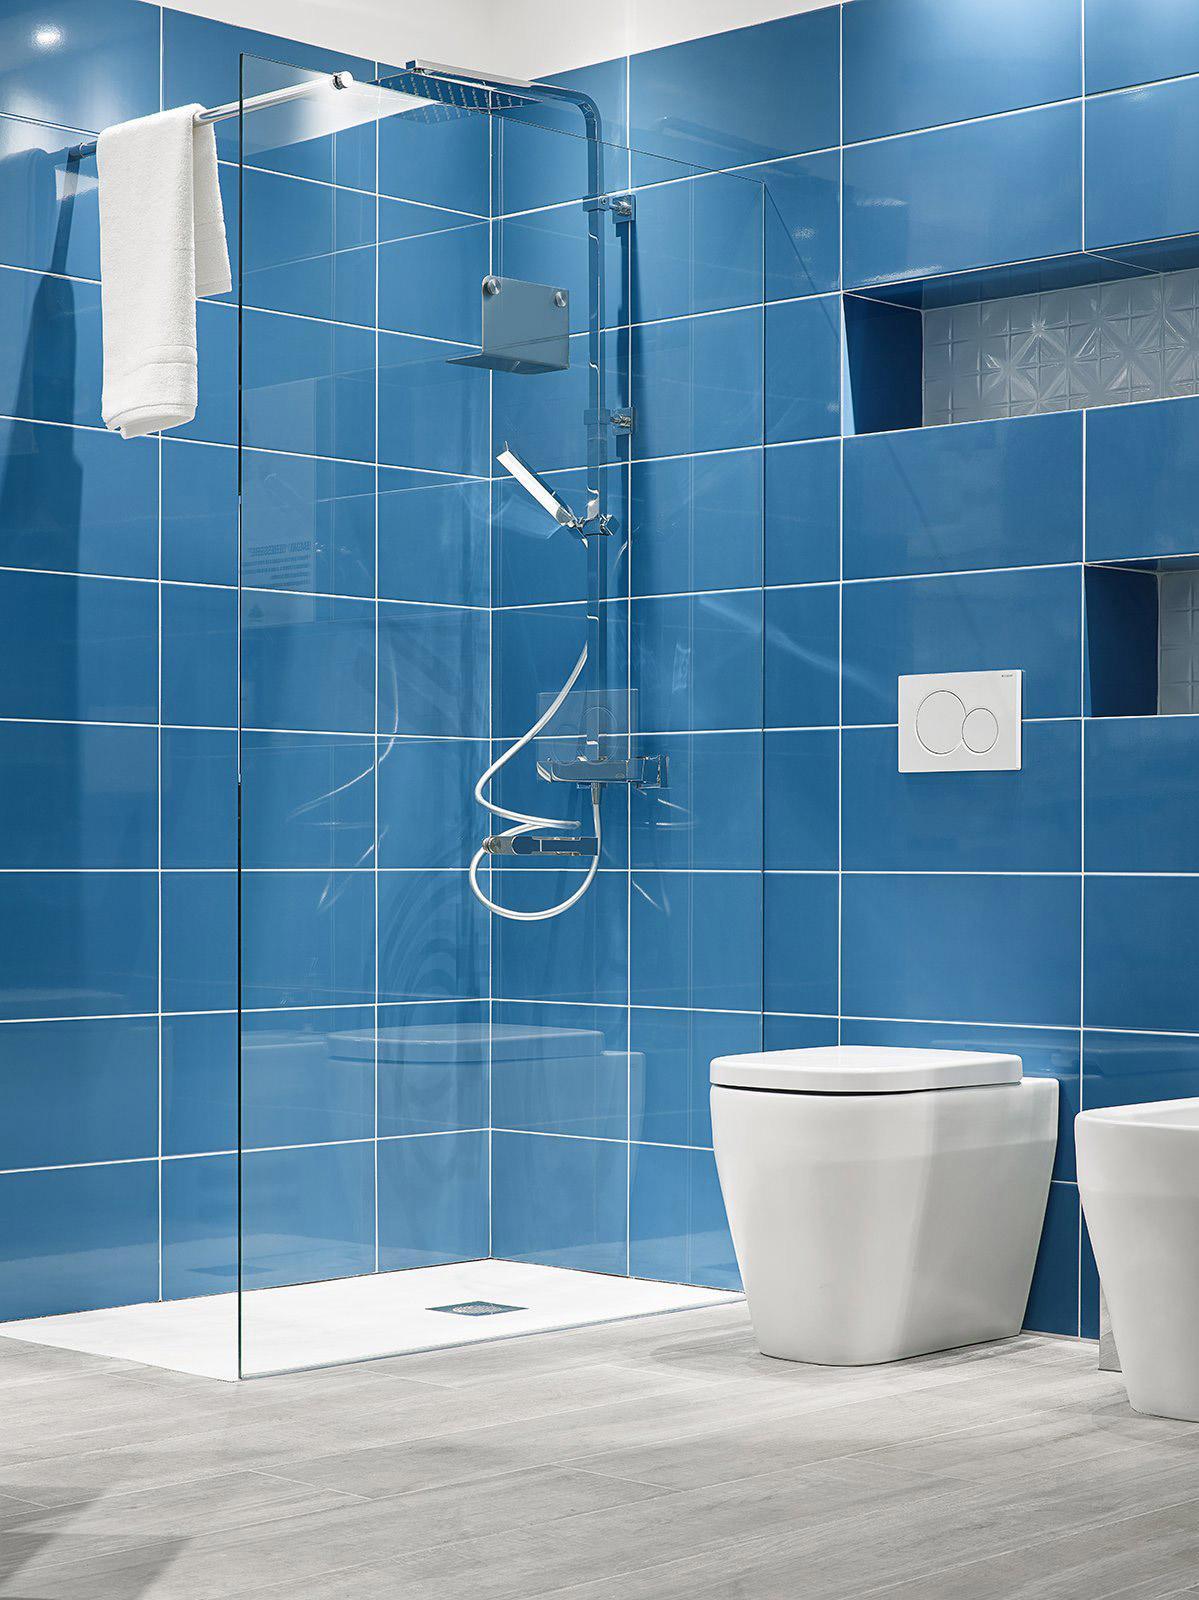 Carrelage mur bleu neo brillante l.25 x L.50 cm, Tonic ARTENS